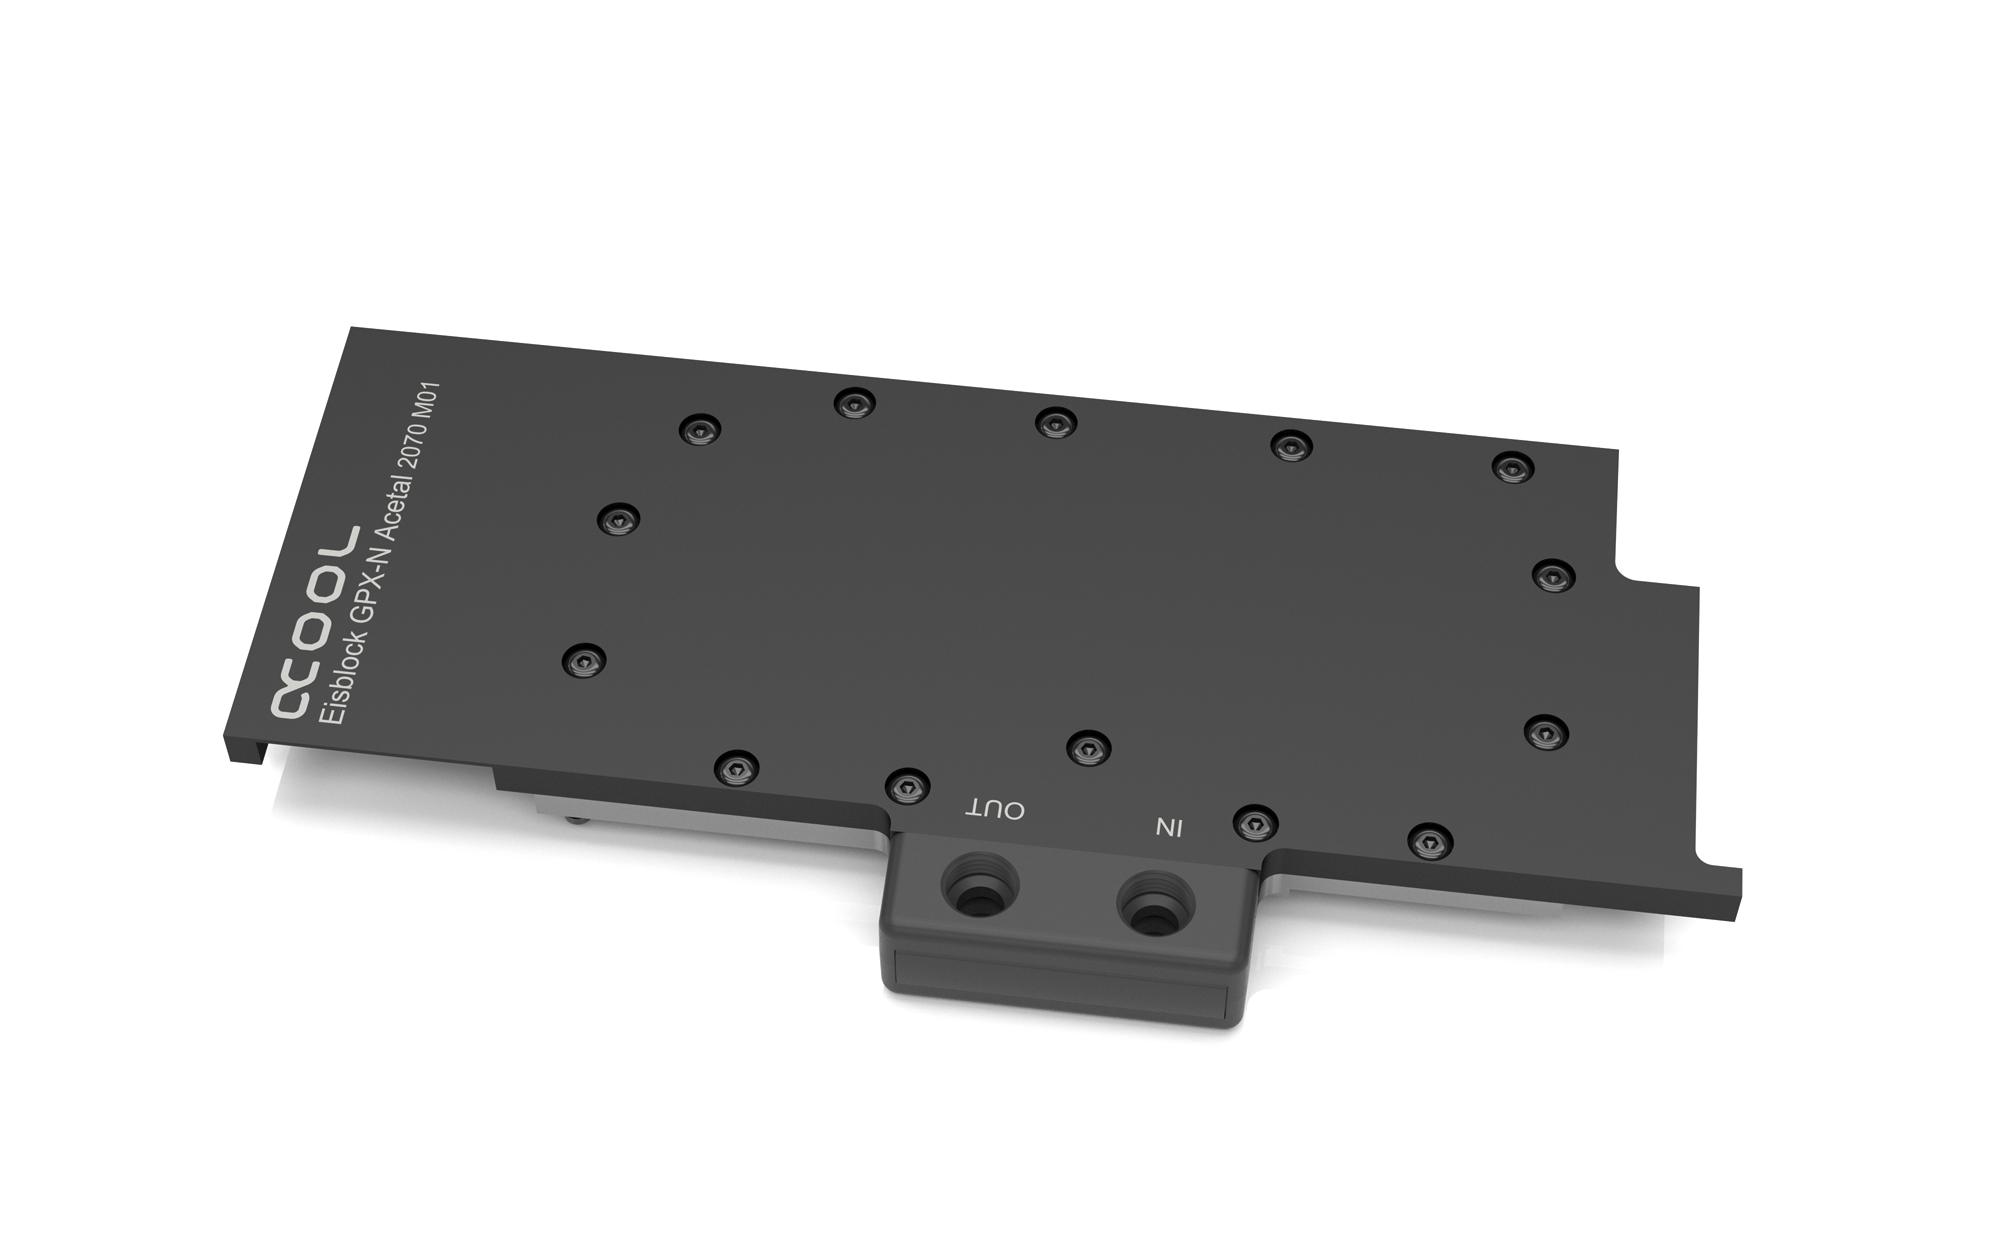 Alphacool Eisblock GPX-N Acetal Nvidia Geforce RTX 2070 M01 /11665/